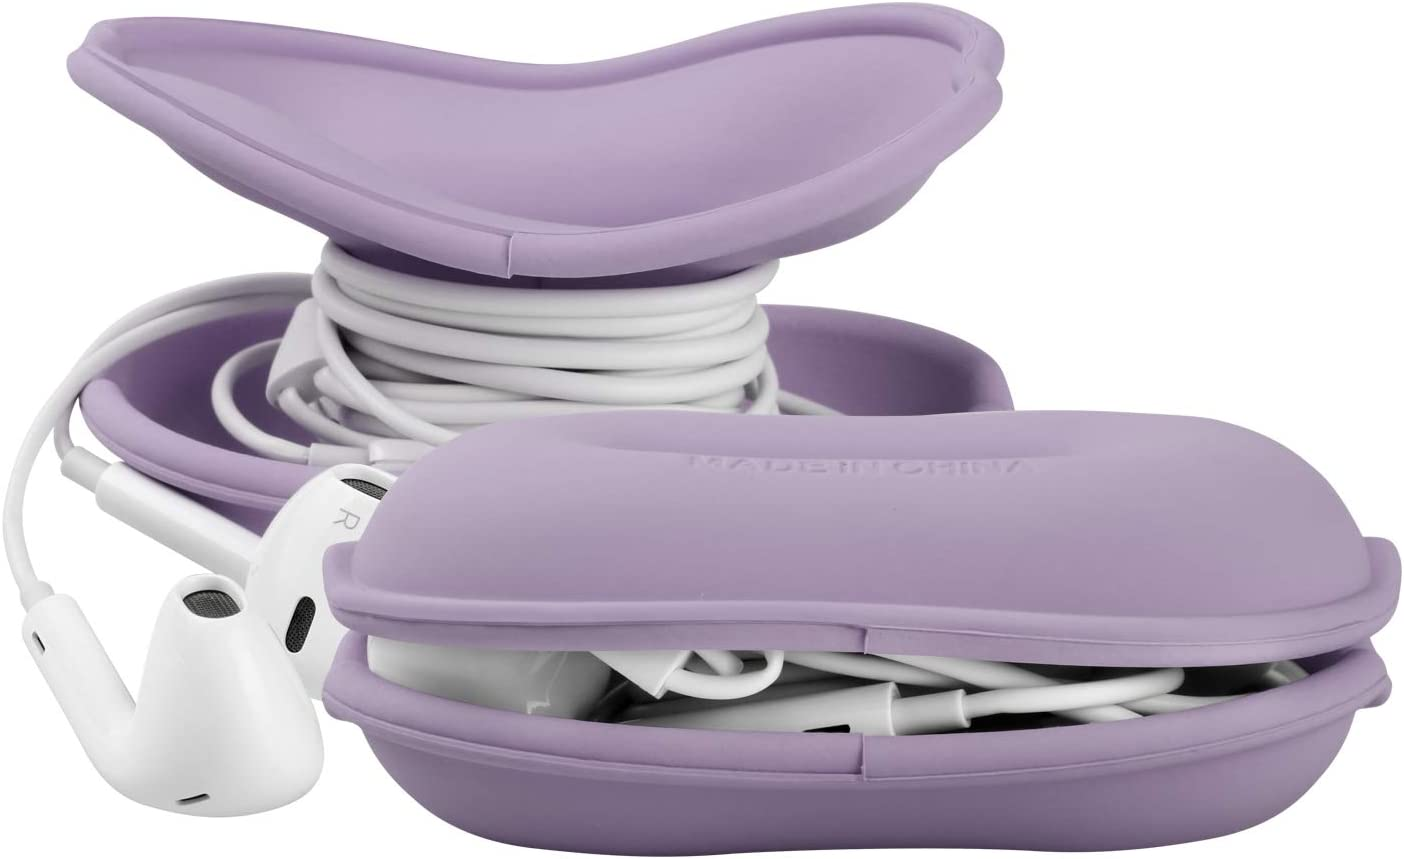 MAIRUI Earbud Case Holder Earphone Case Wrap Earbuds Nest Tangle Free Silicone Organizer (Purple)